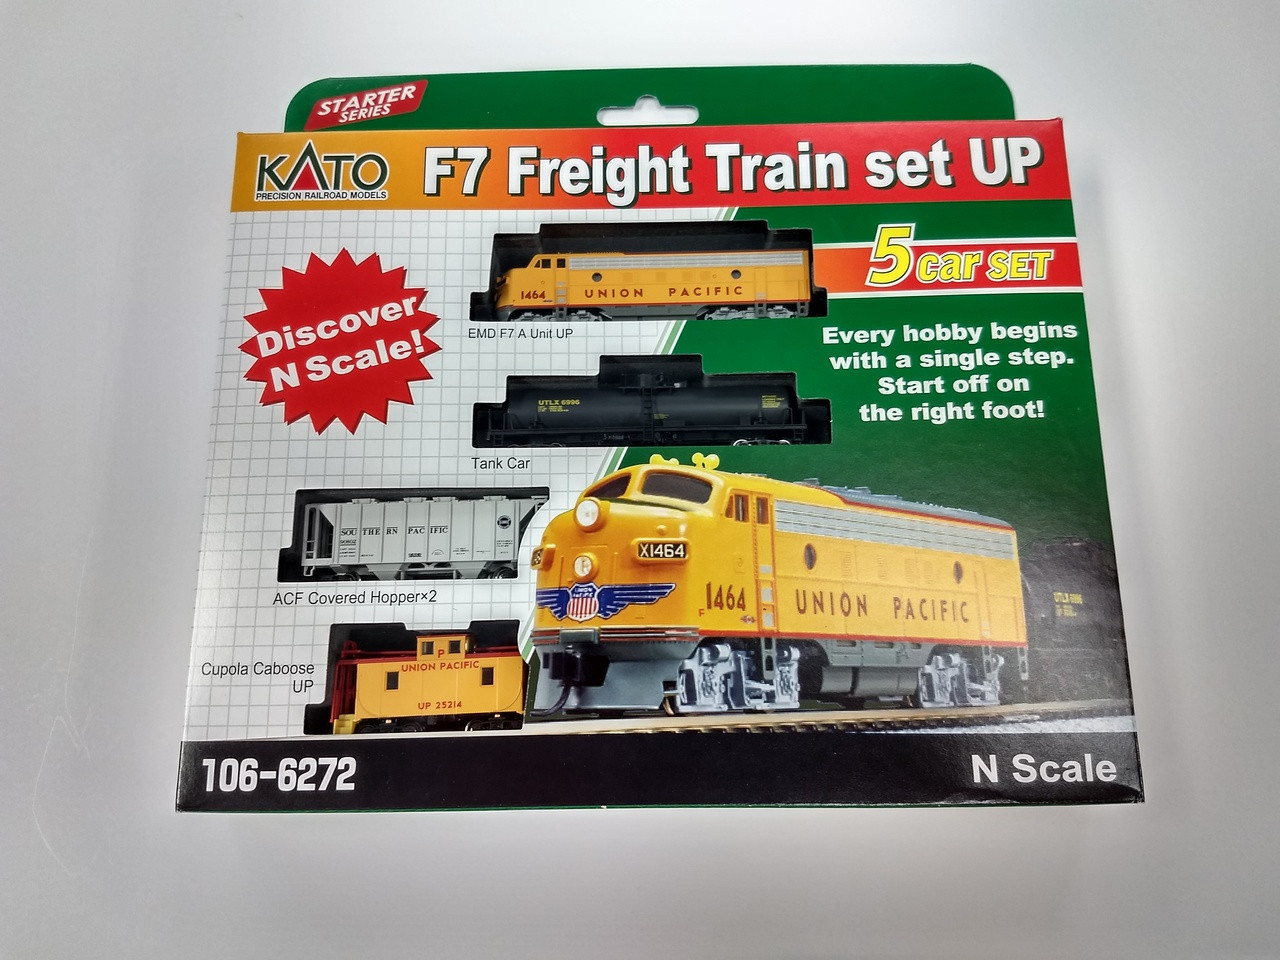 Kato N Scale EMD F7 Union Pacific Freight Train Set